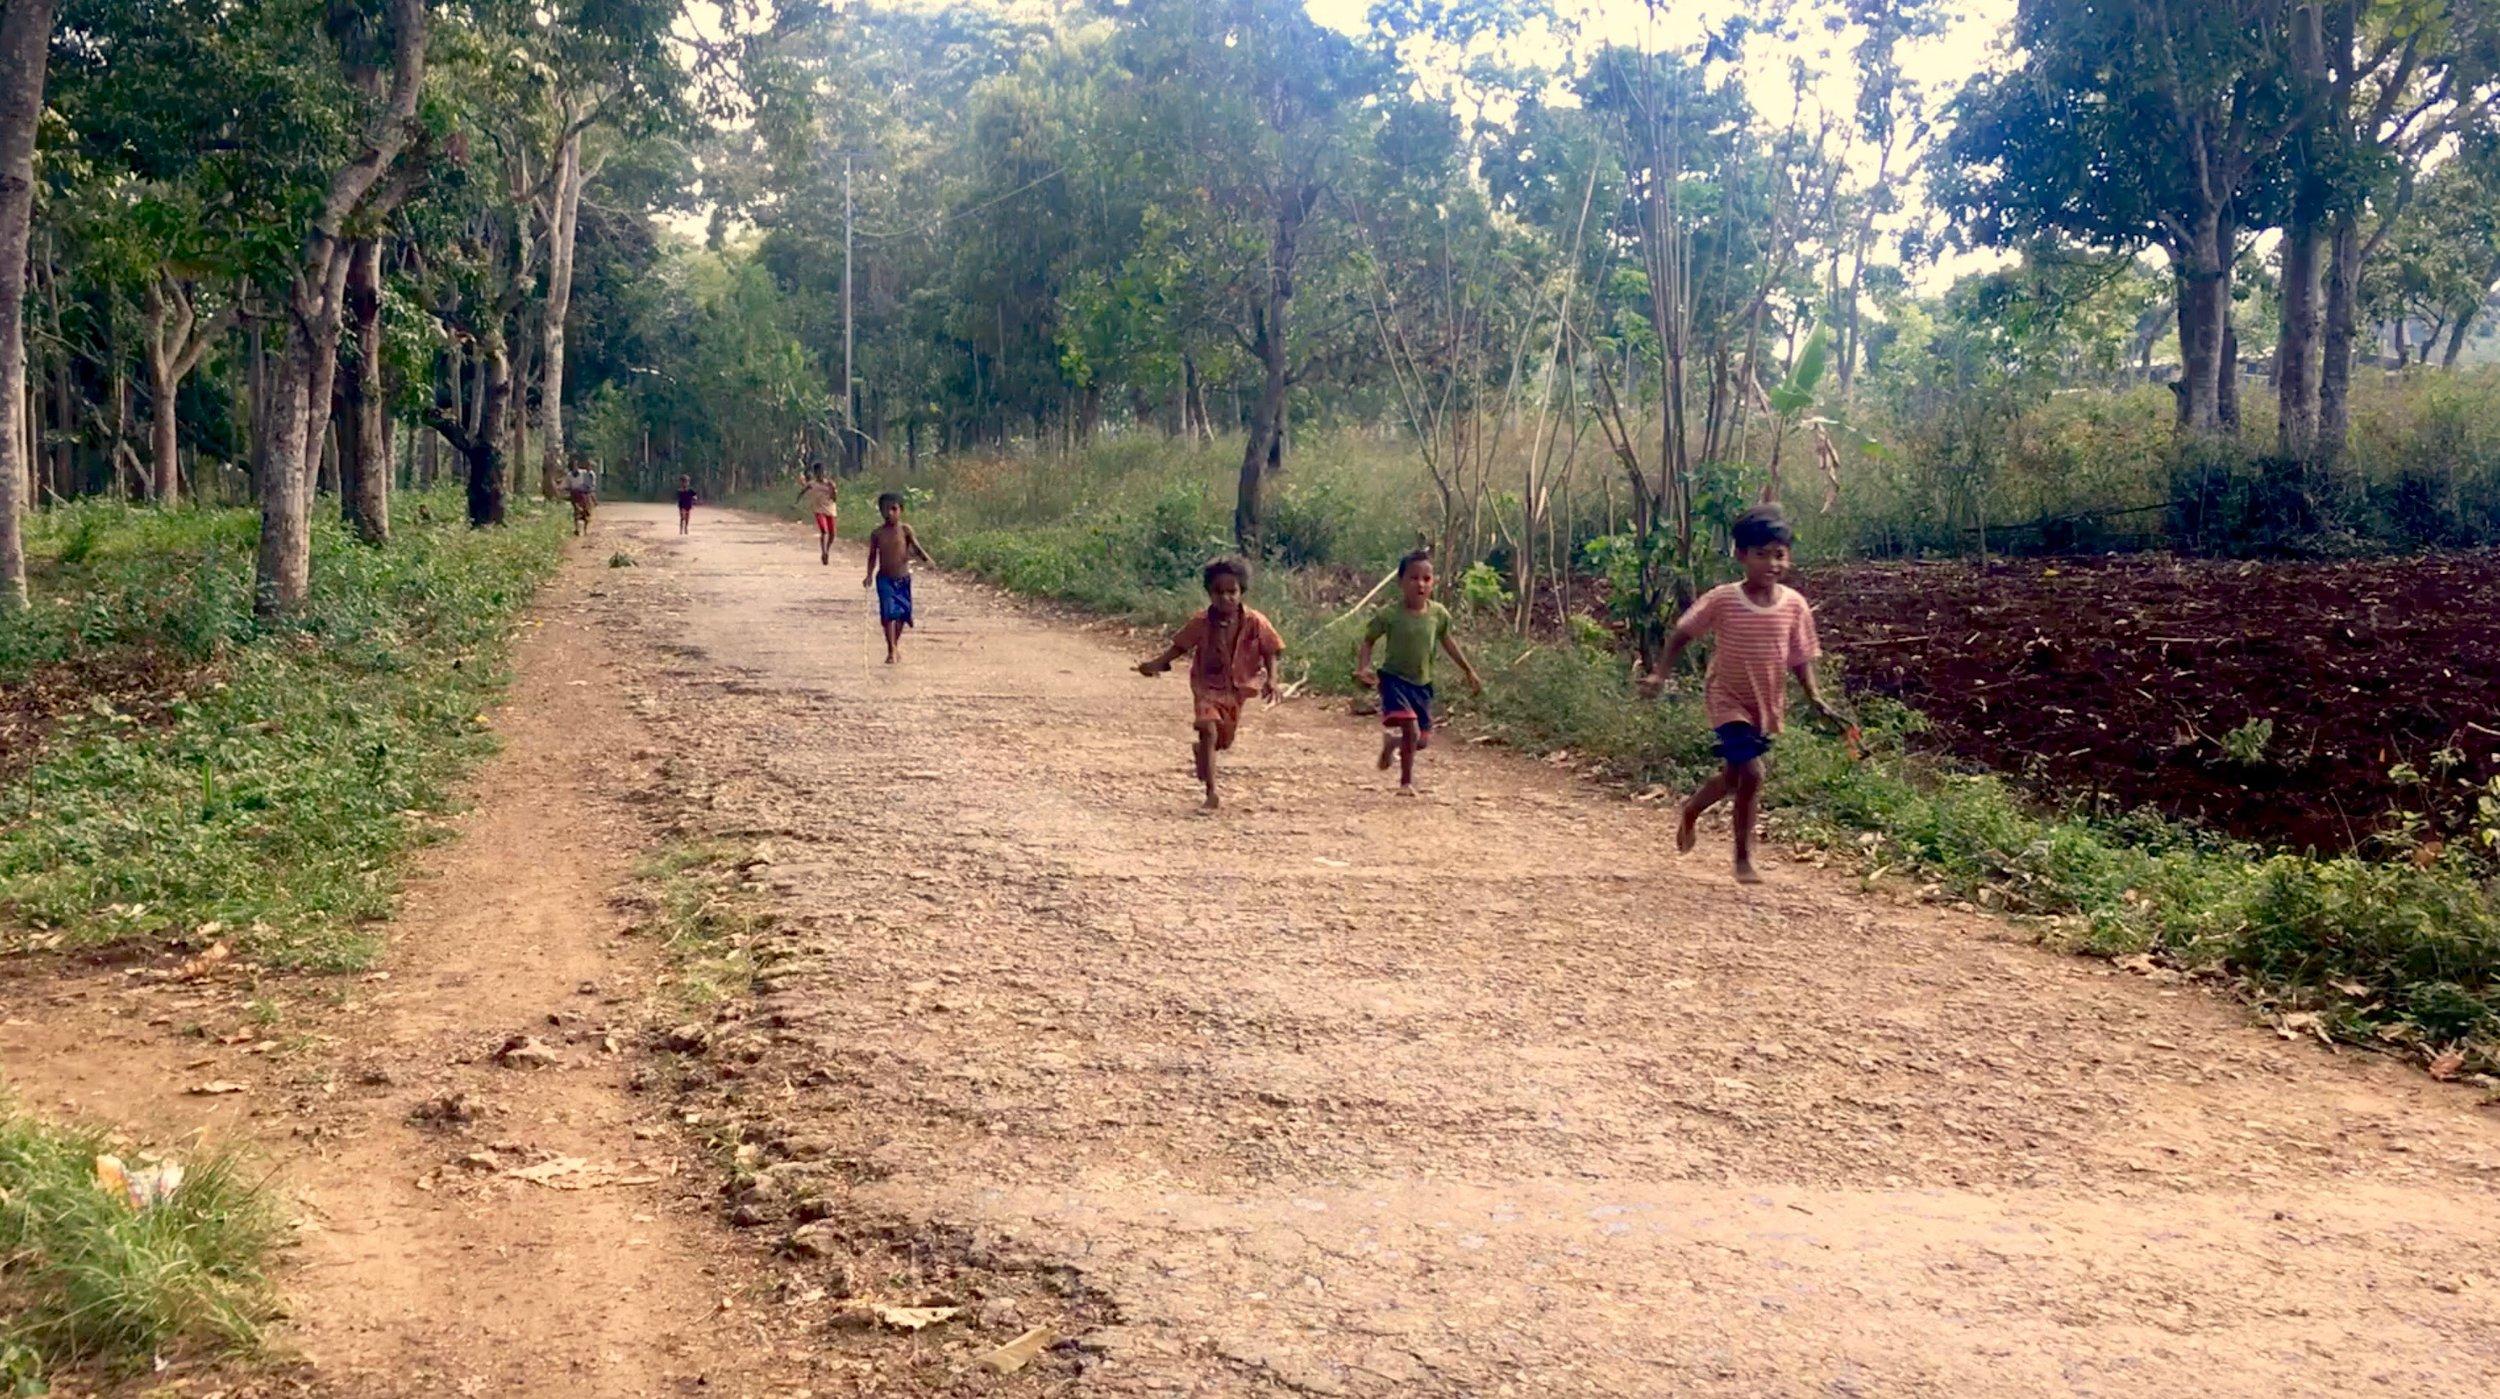 Young children in the village of Triloka, Timor-Leste photo by Davar Ardalan